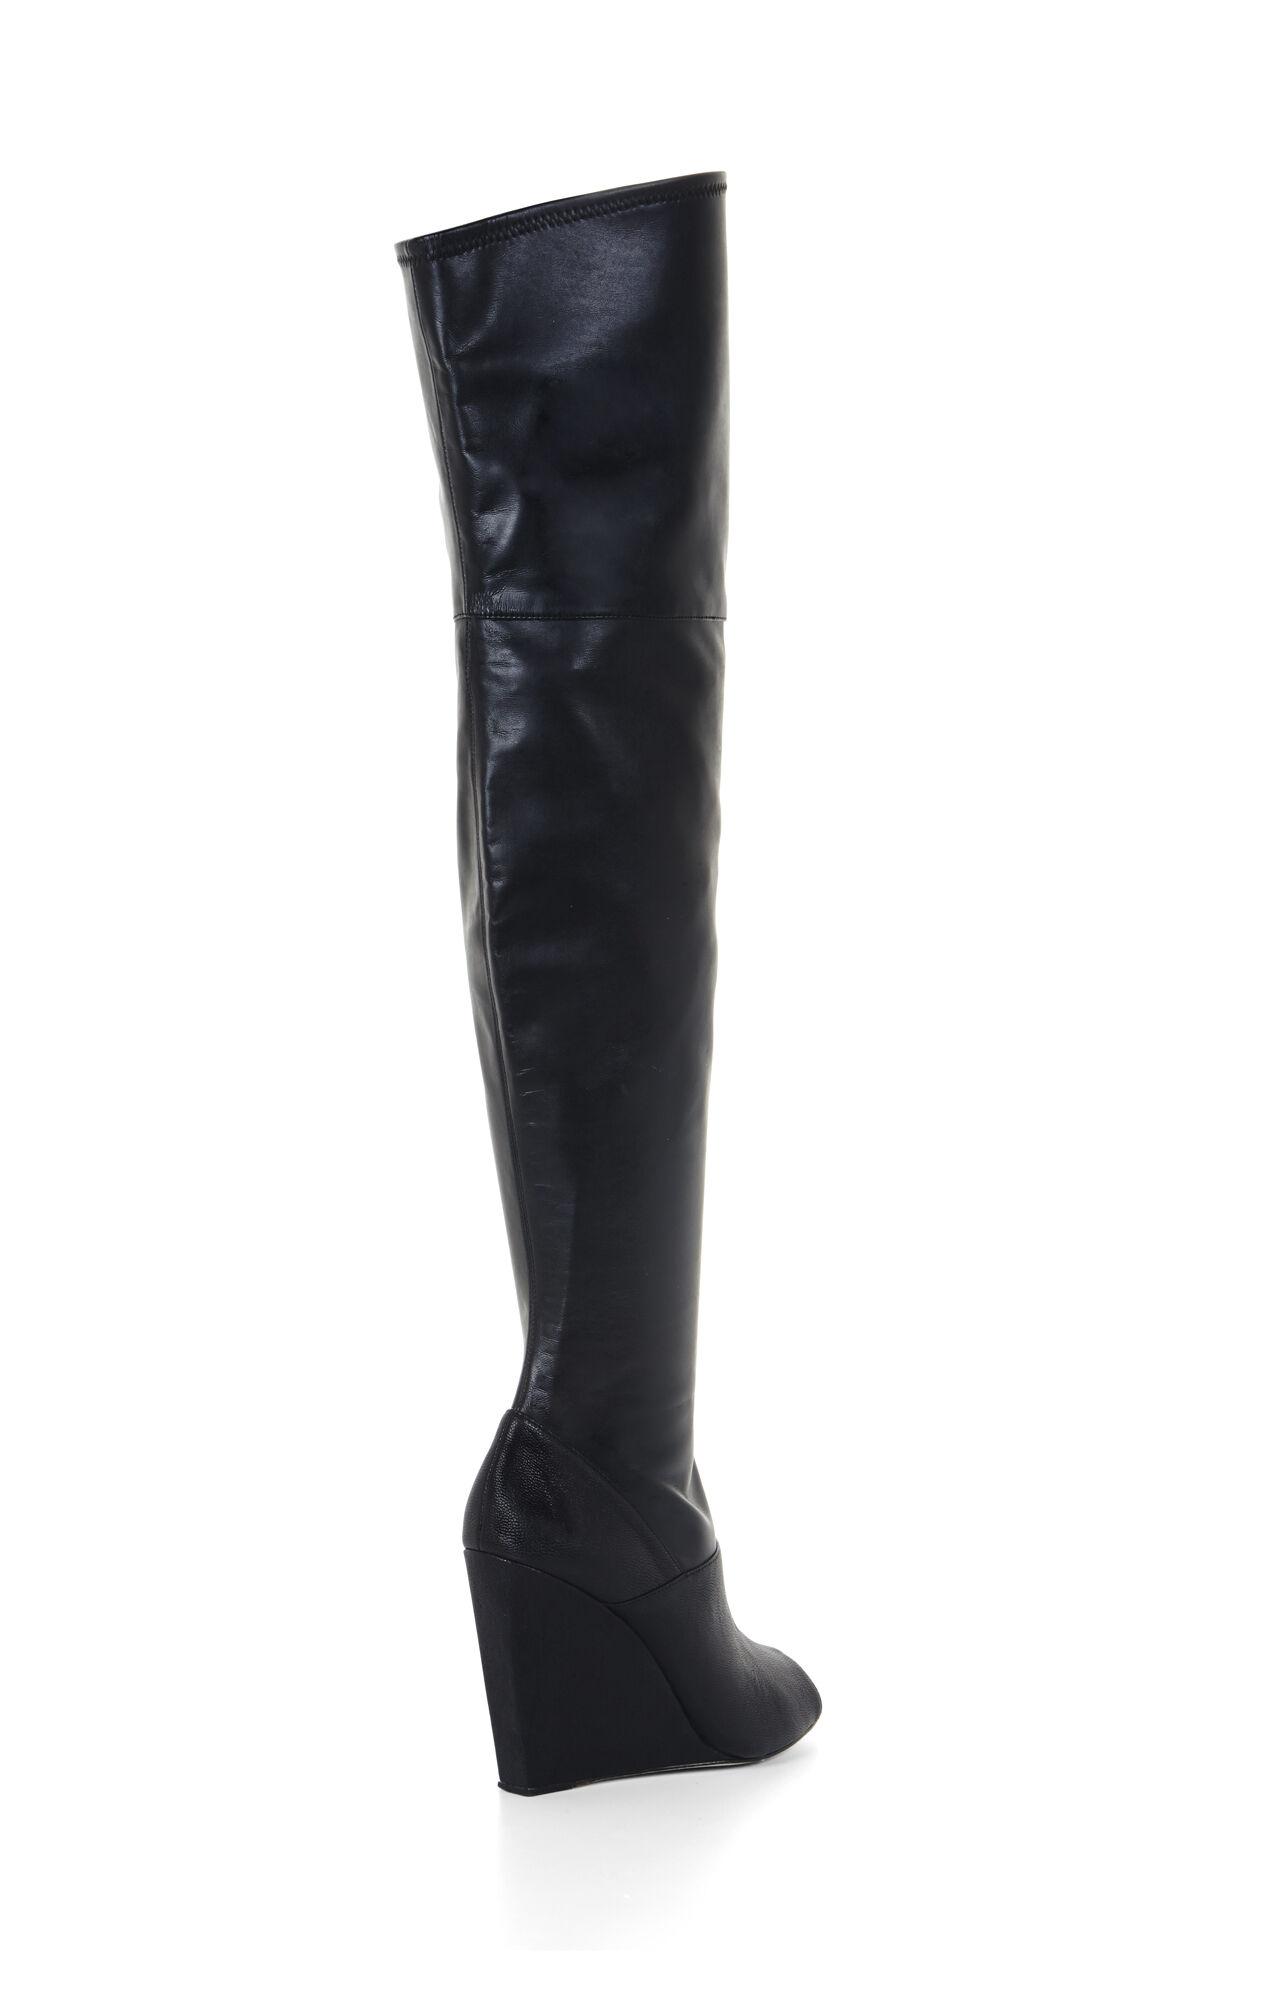 Gian Peep-Toe Wedge Tall Boot